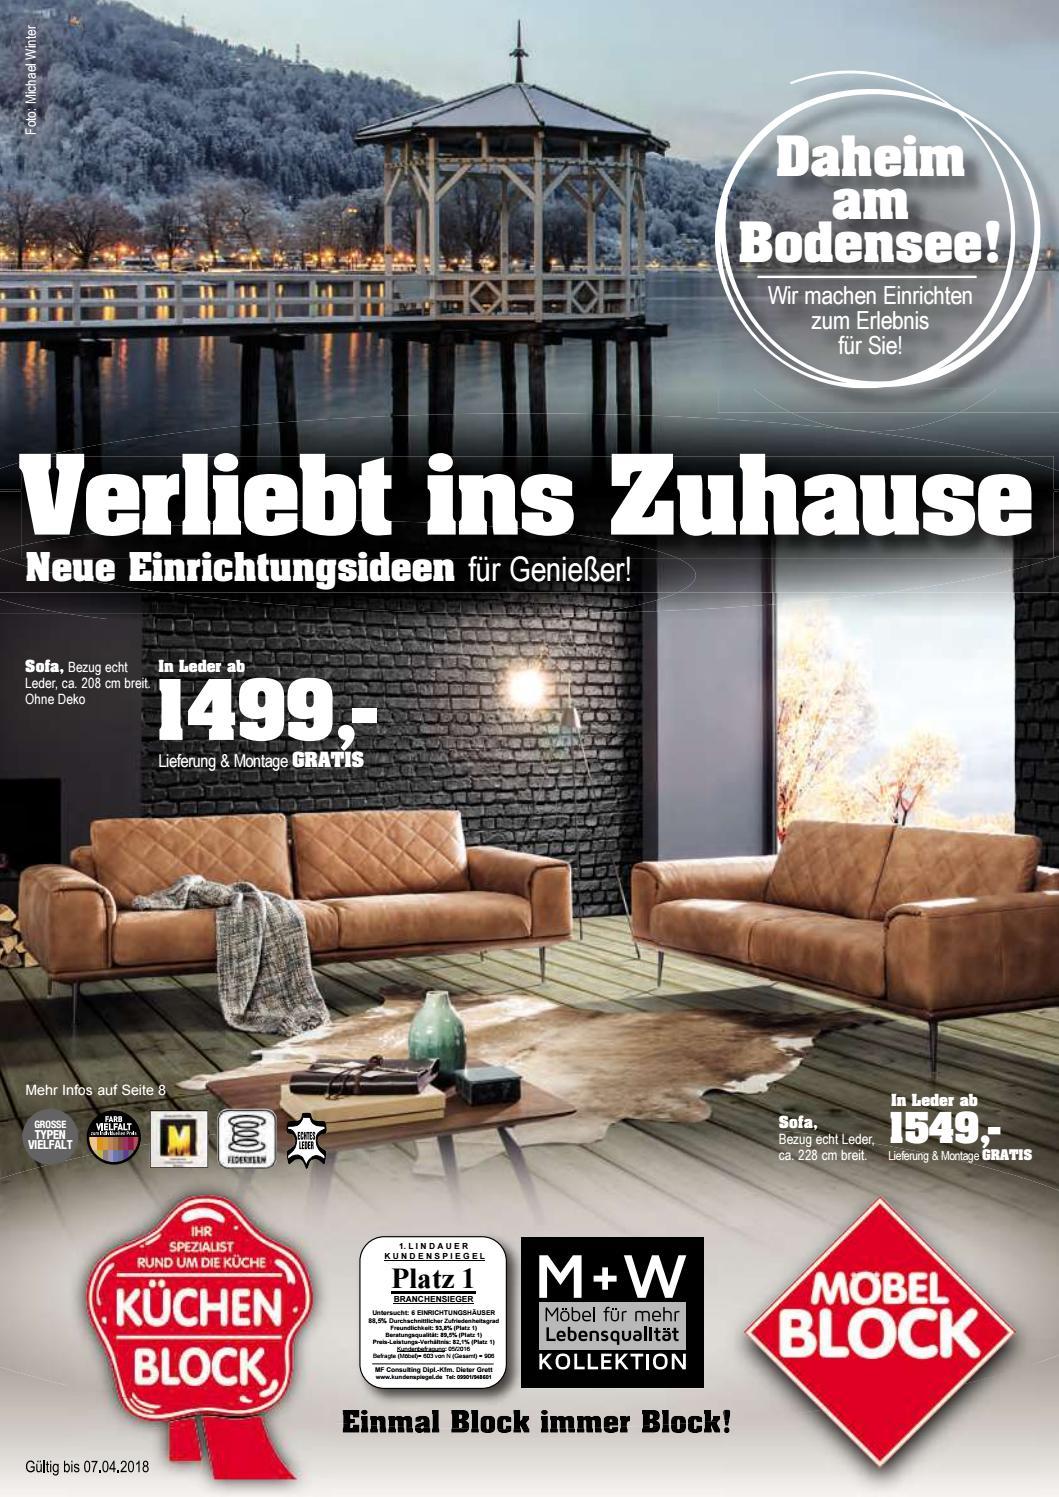 Moebel block kw9 by Russmedia Digital GmbH - issuu